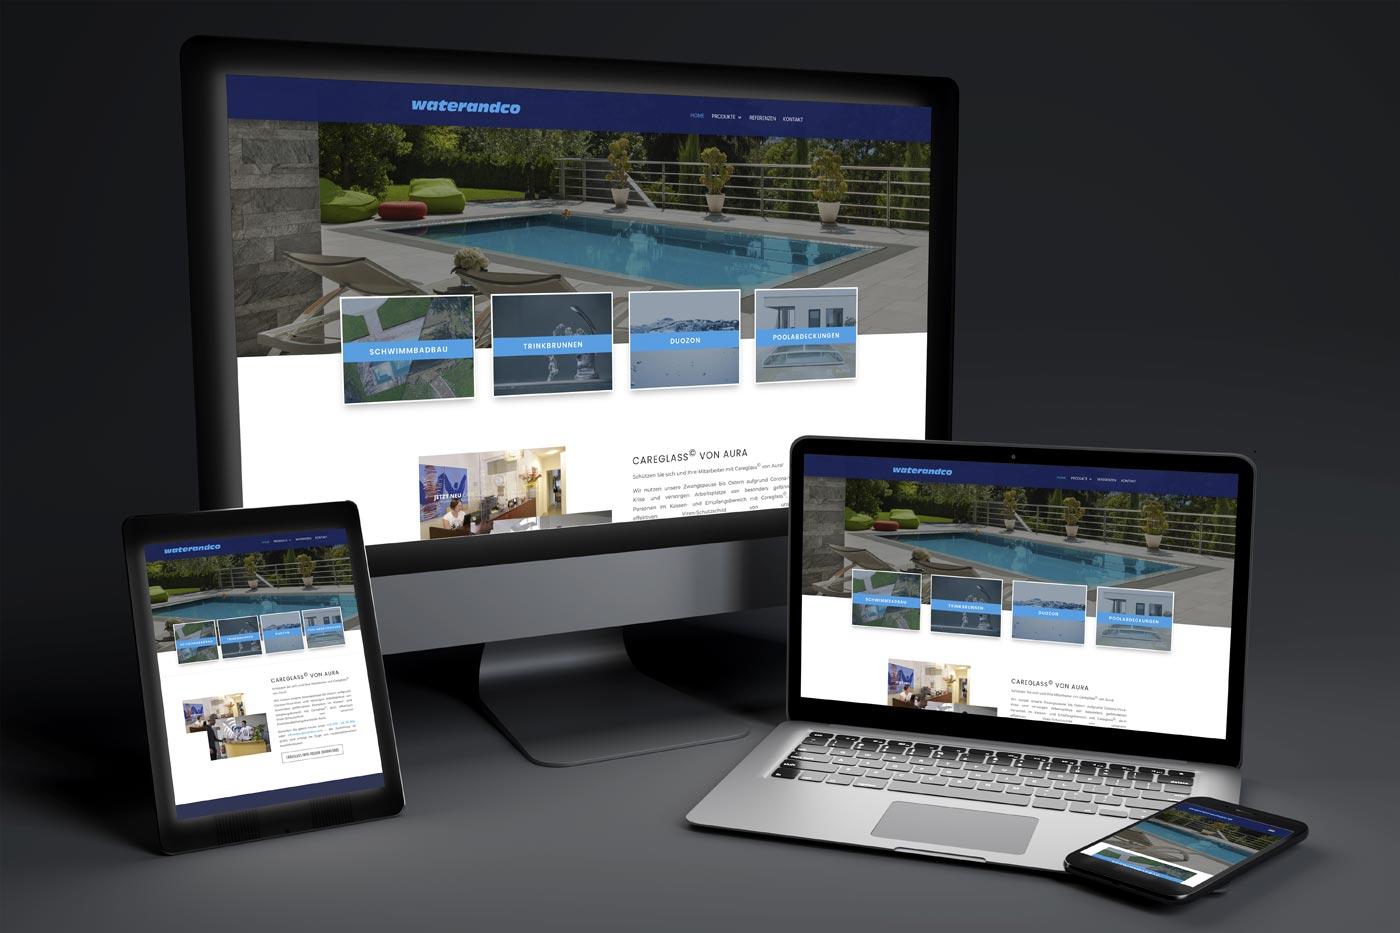 Webdesign Graz: perfect:net, waterandco.at